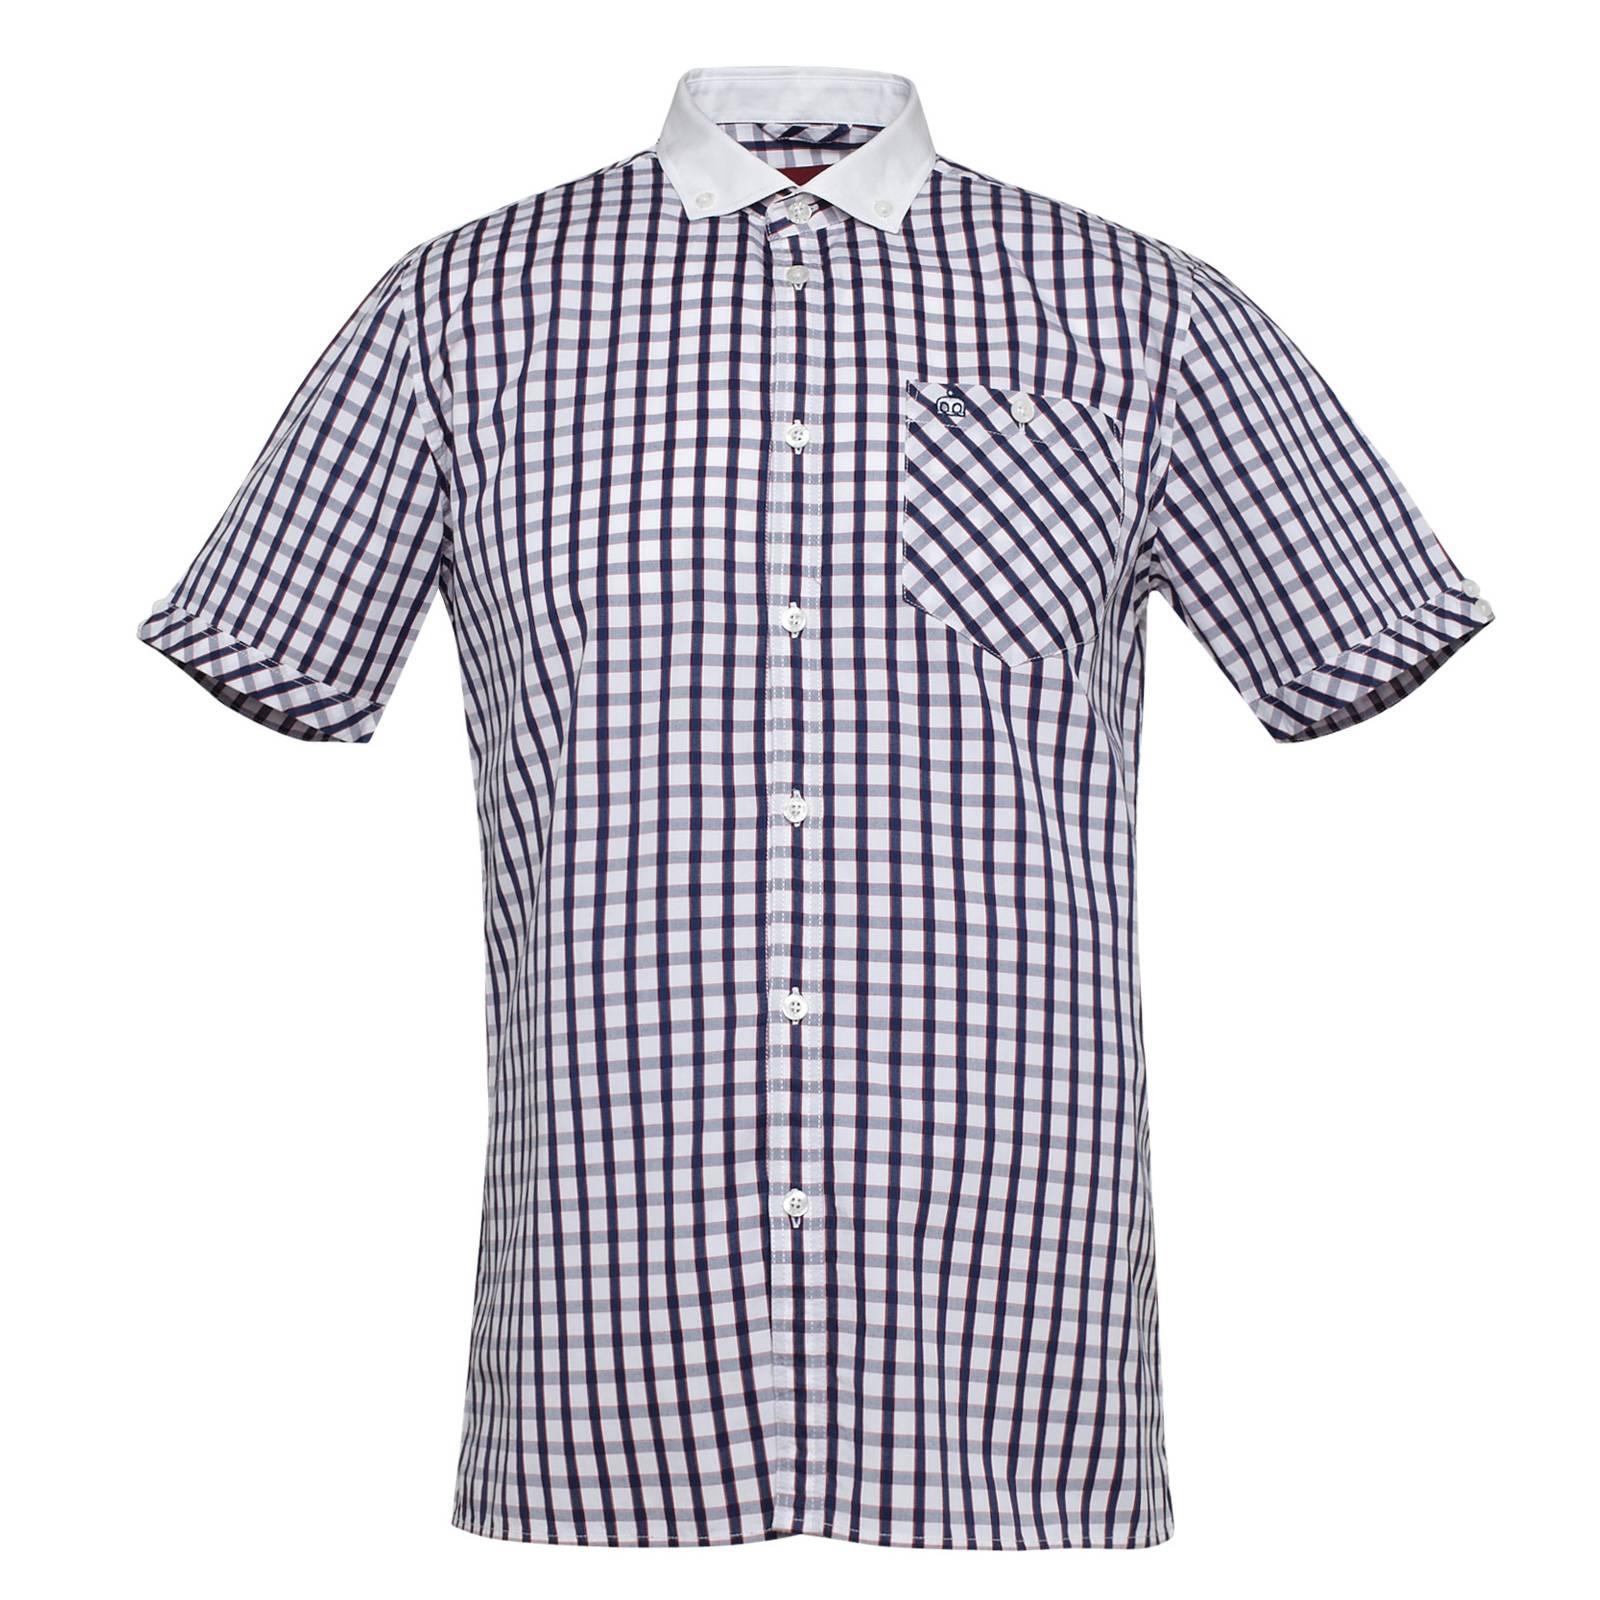 Рубашка Langton от MercLondon